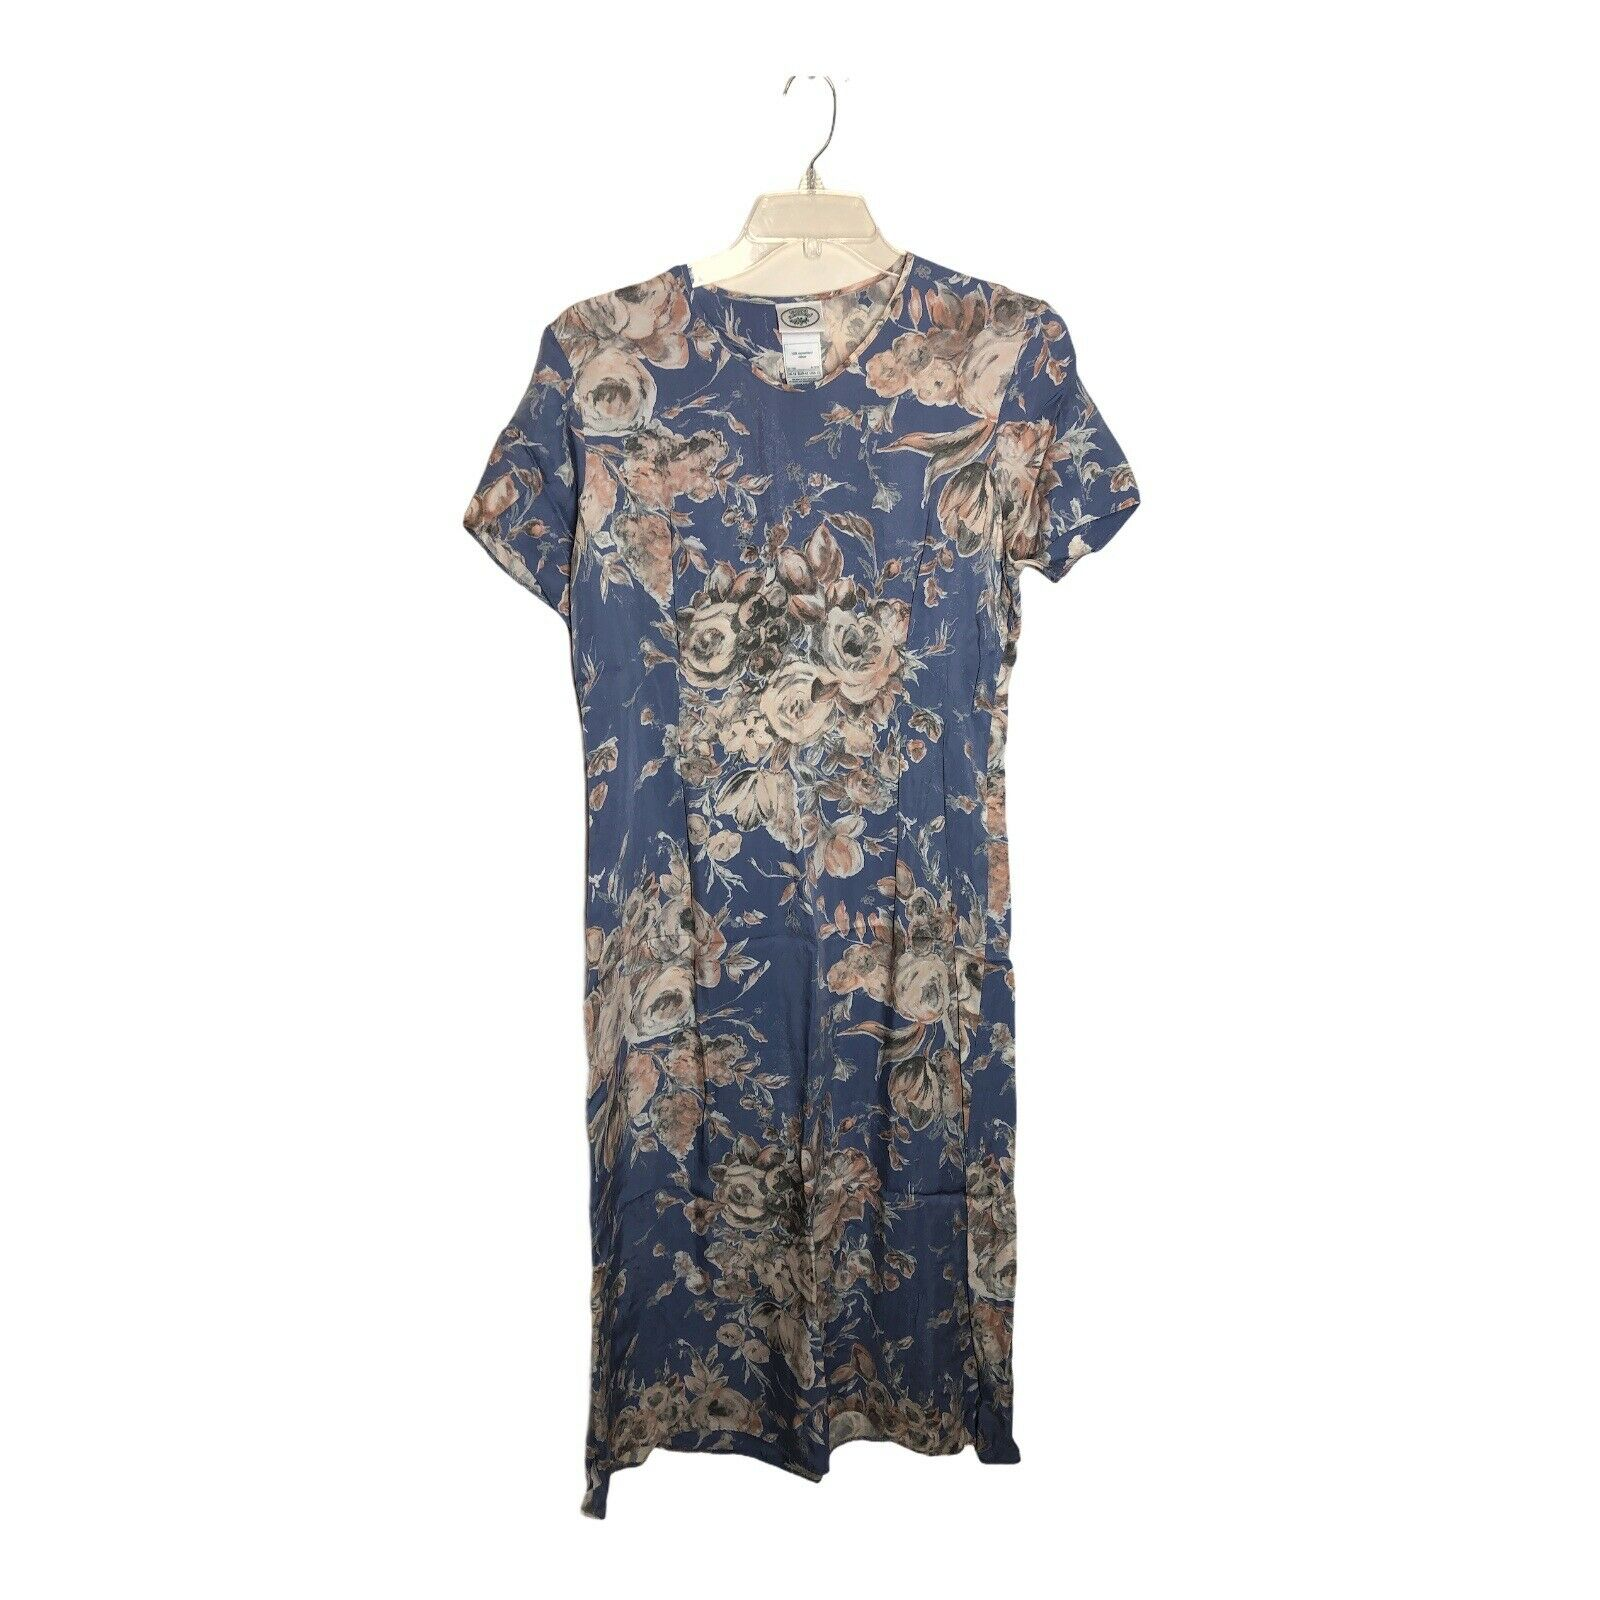 Vtg Laura Ashley Floral Dress Blue Size US 12 Cot… - image 1